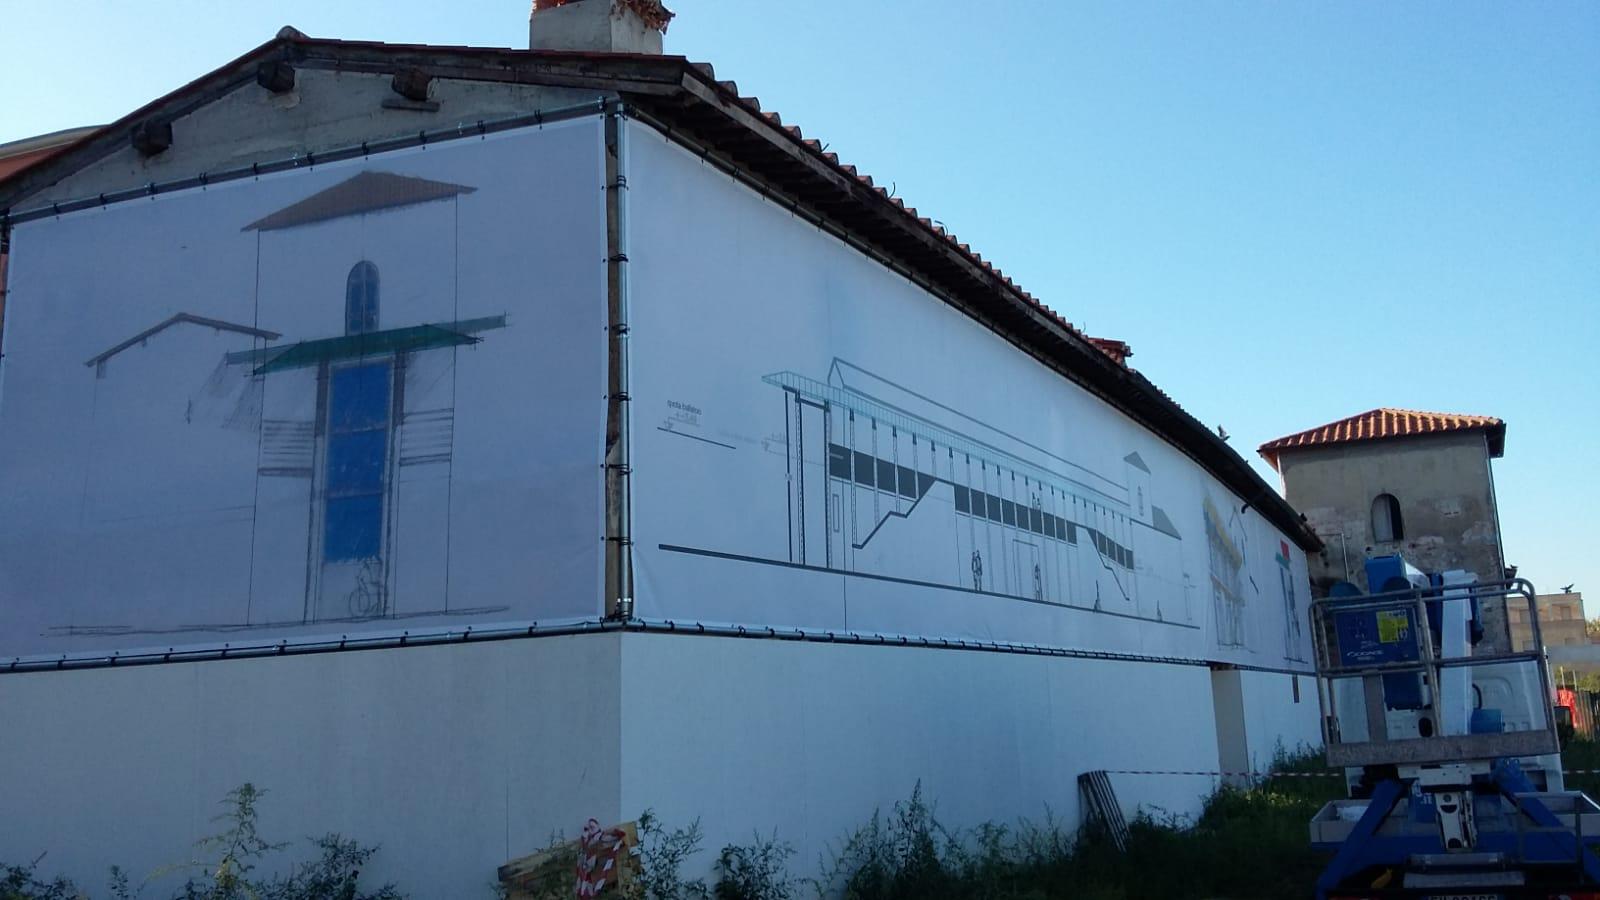 Teloni per copertura facciate maxi banner PVC outdoor